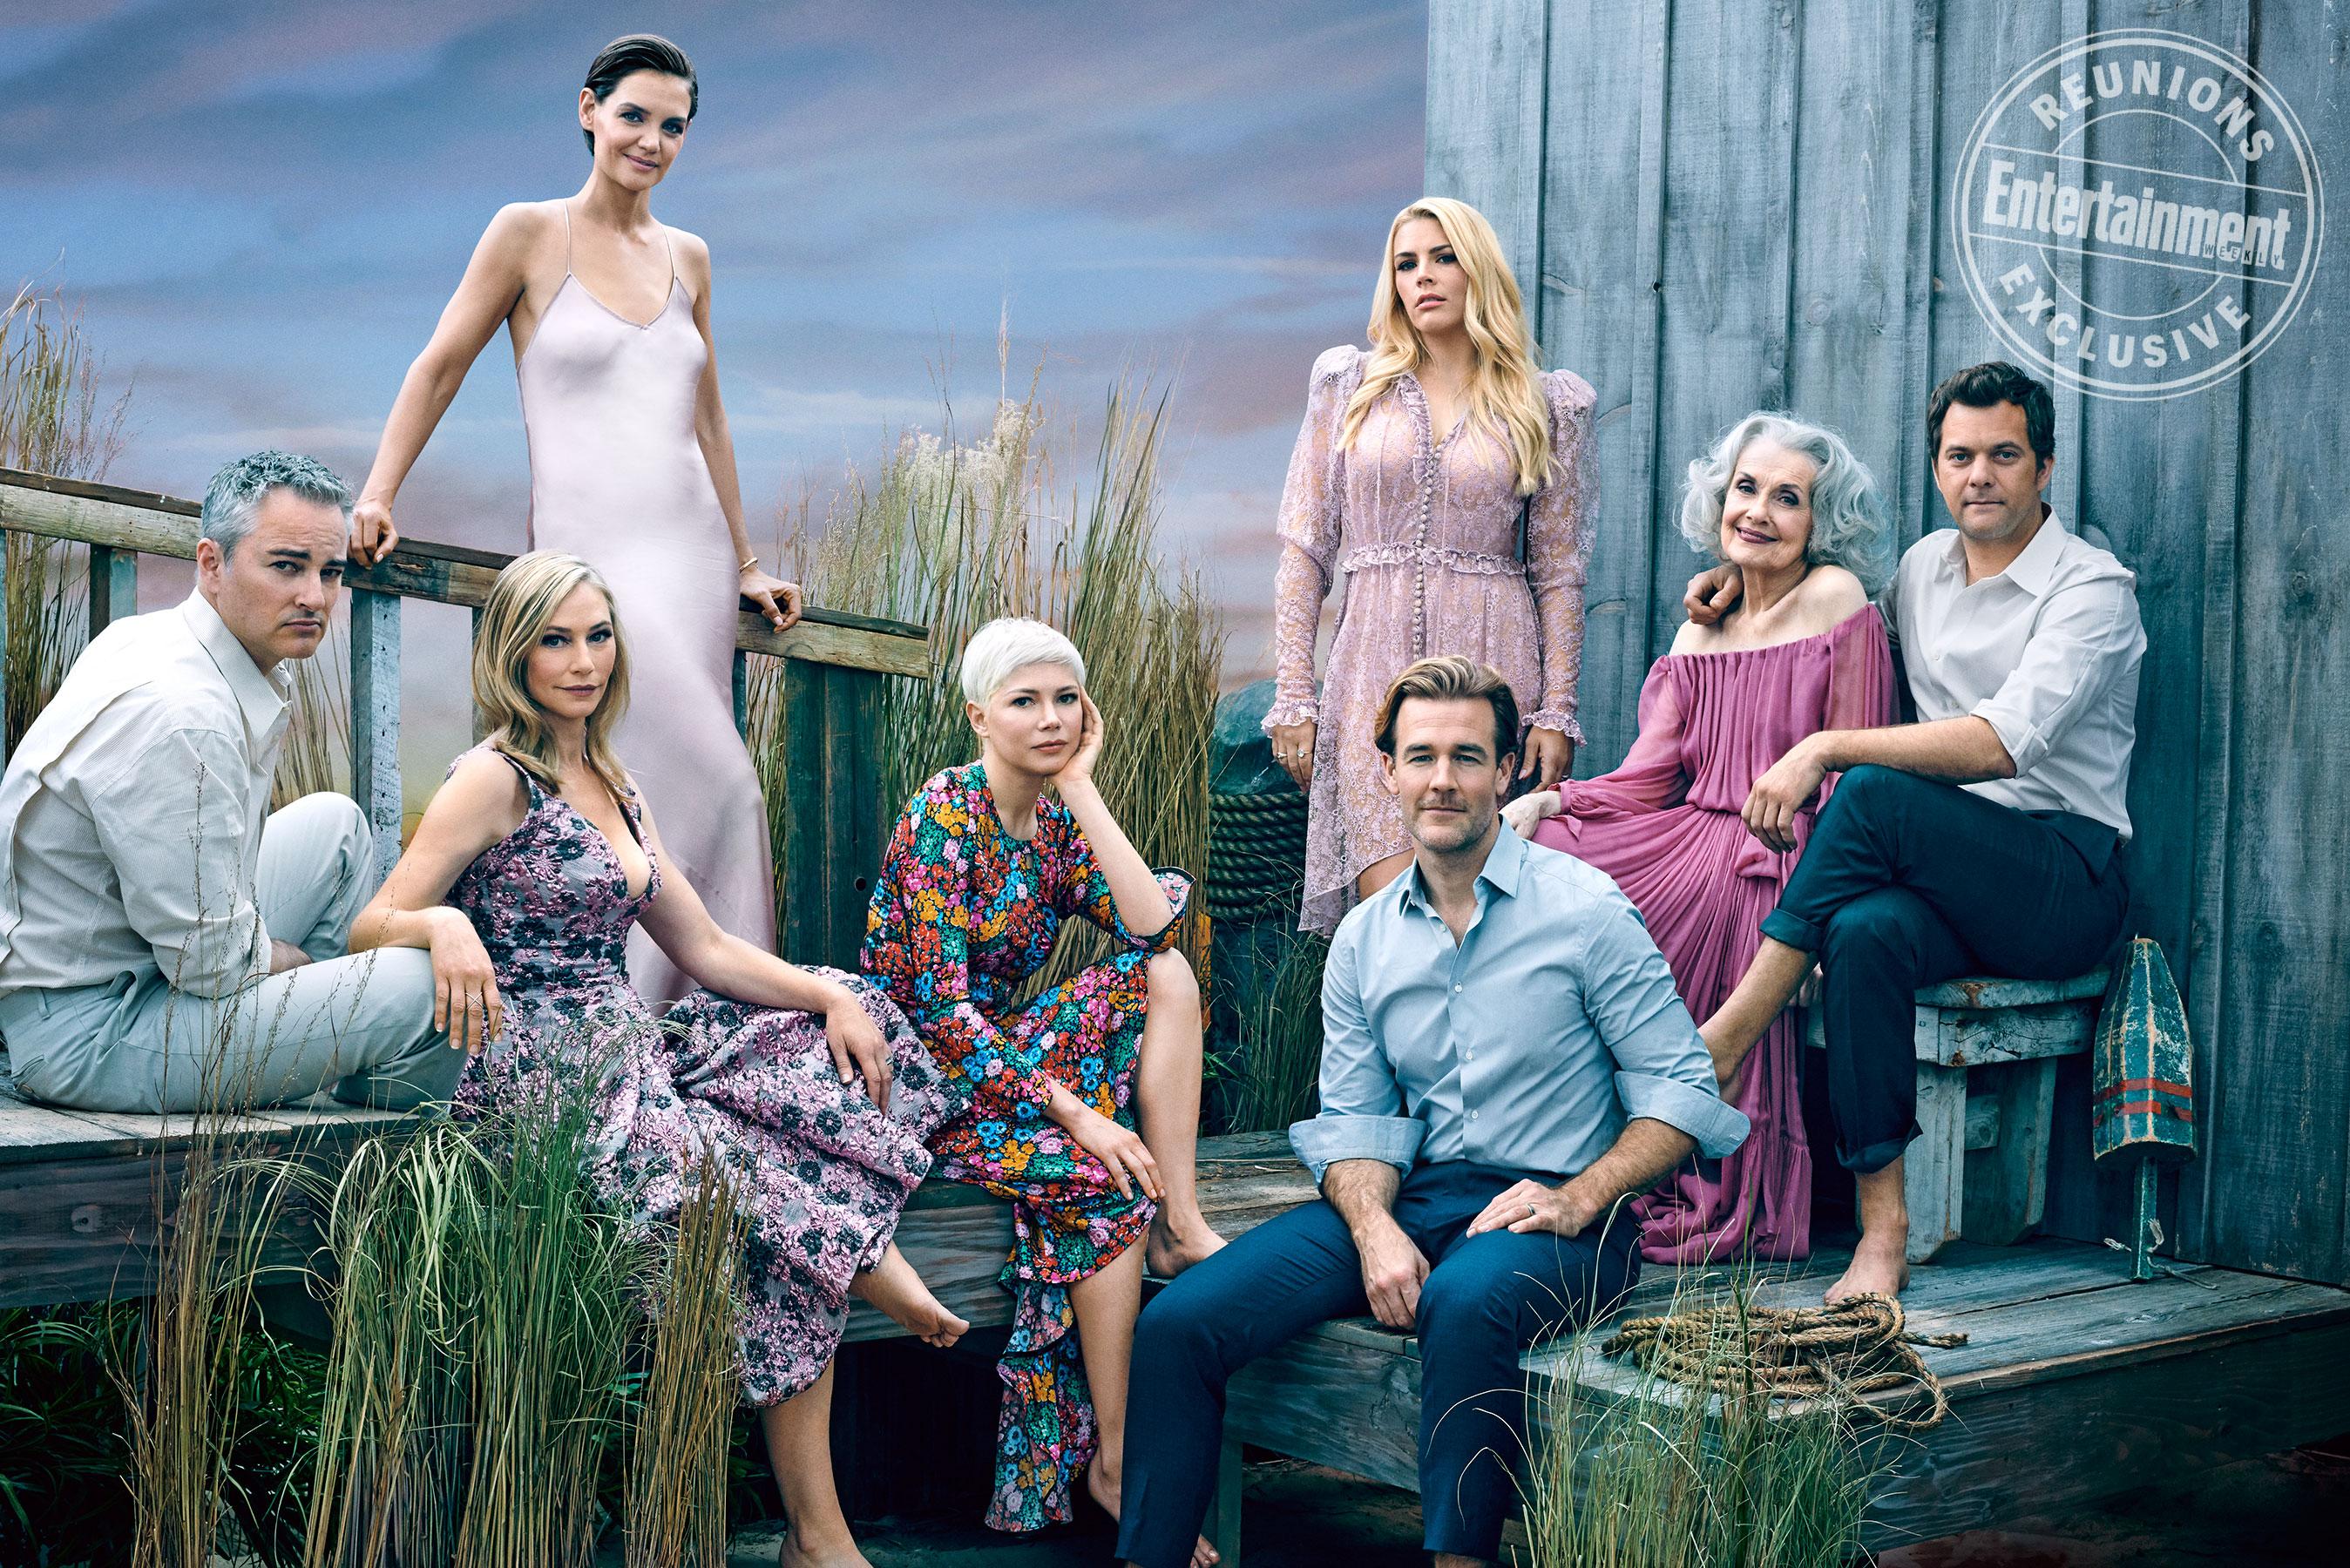 Dawson's Creek: Entertainment Weekly